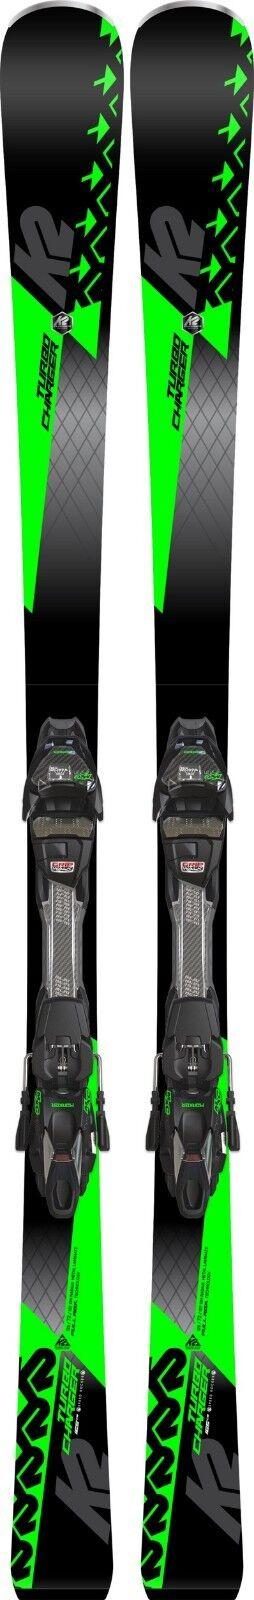 K2 Turbo Charger Mxc 12 Tcx Light Quik Unisex Ski - NEU - 10C0002-267